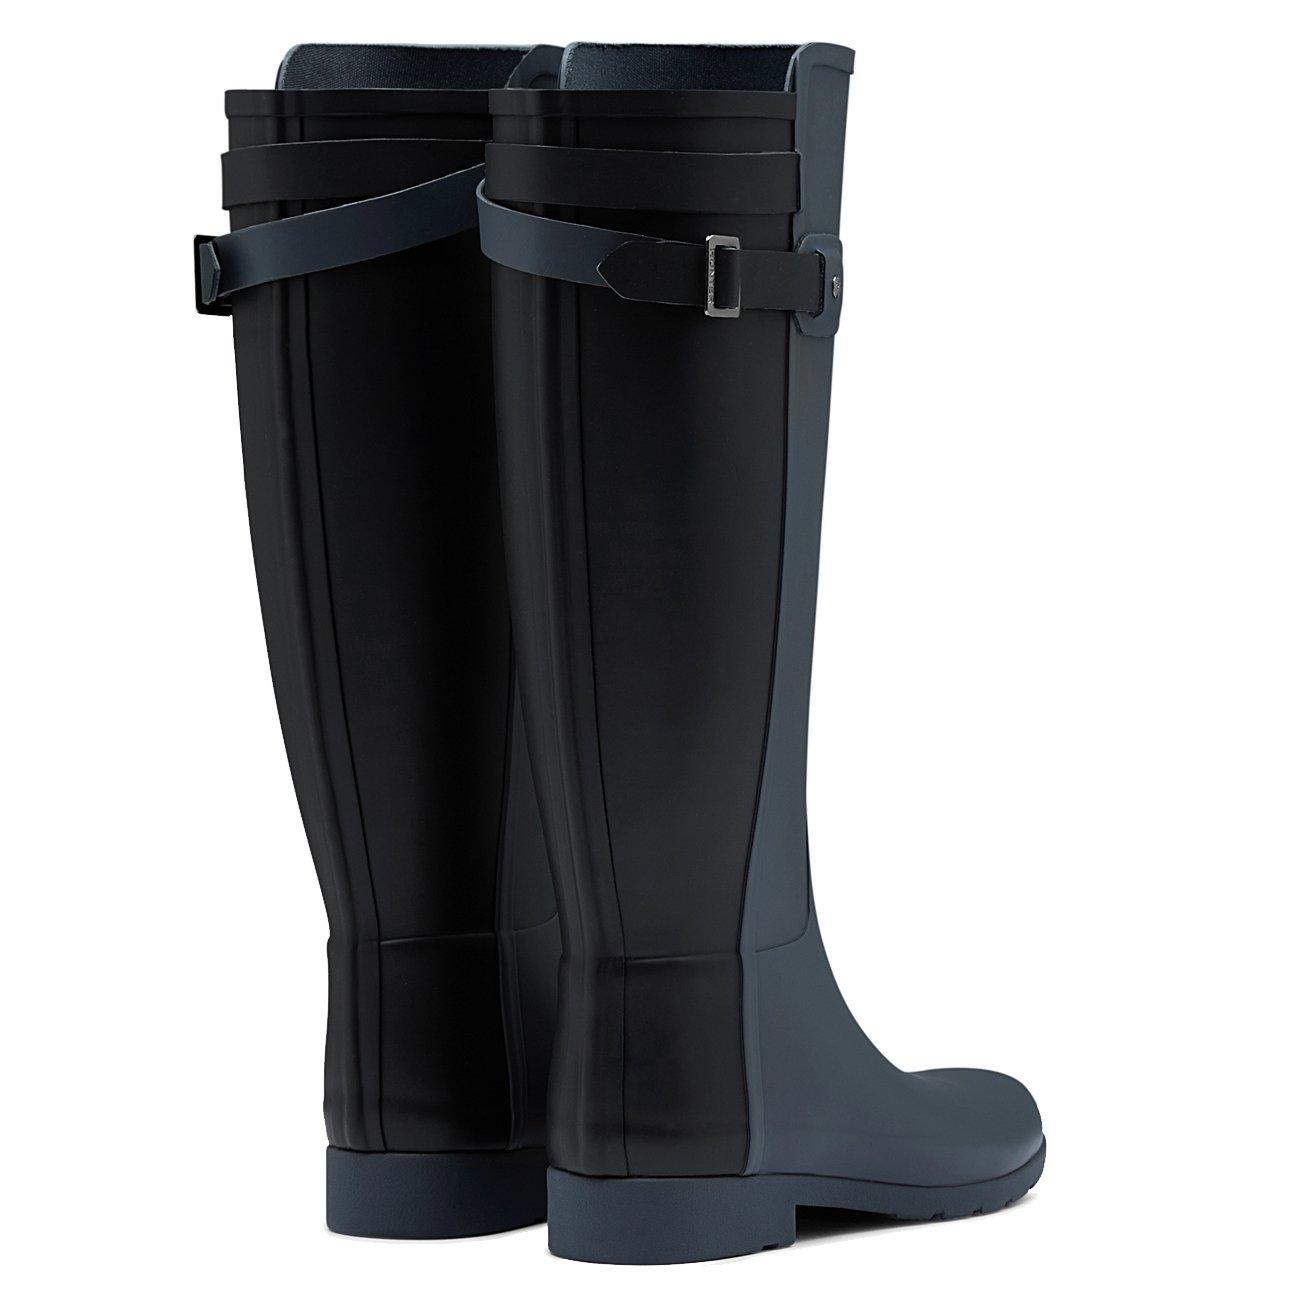 Womens Hunter Original Refined Back Strap Snow Wellingtons Rain Boot B01JOTWMCG 9 B(M) US|Dark Slate/Black